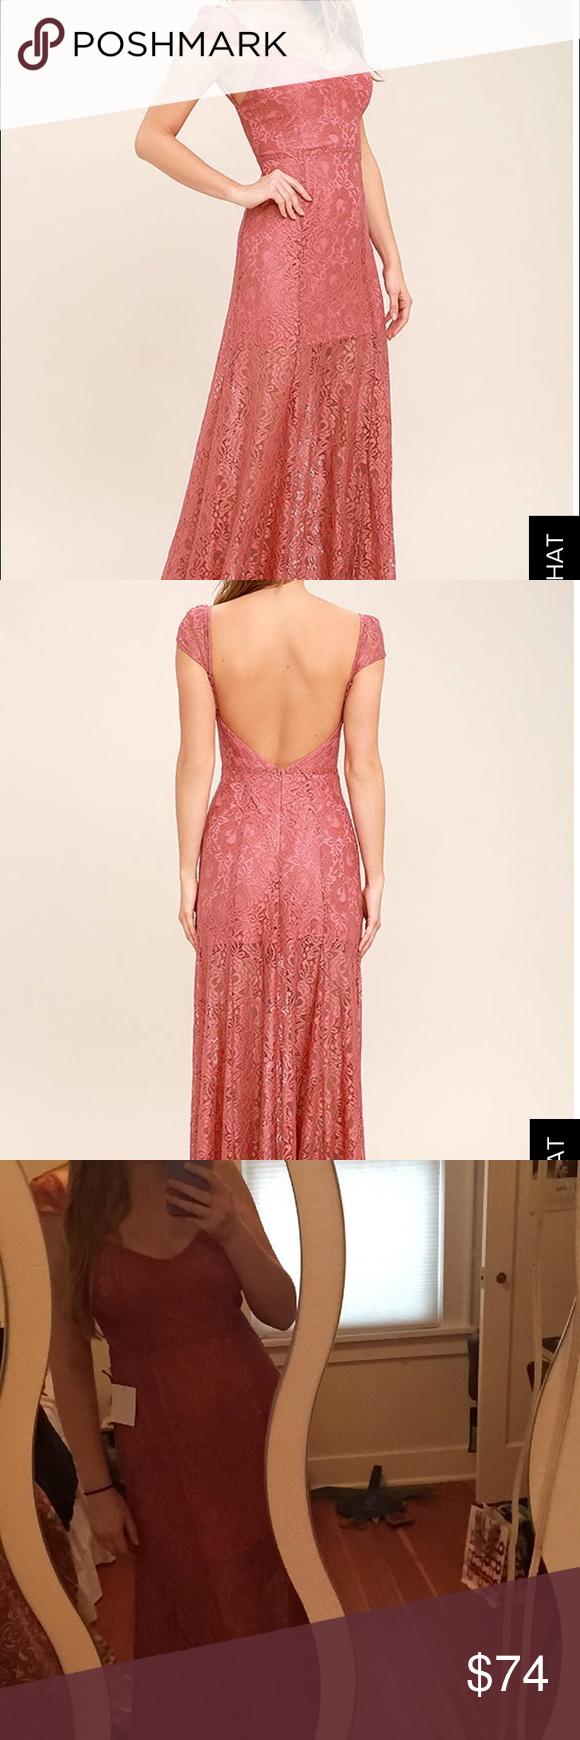 Lulus wedding guest dress  Luluus Evening Dreamy Rusty Rose Lace Maxi Dress Beautiful rusty